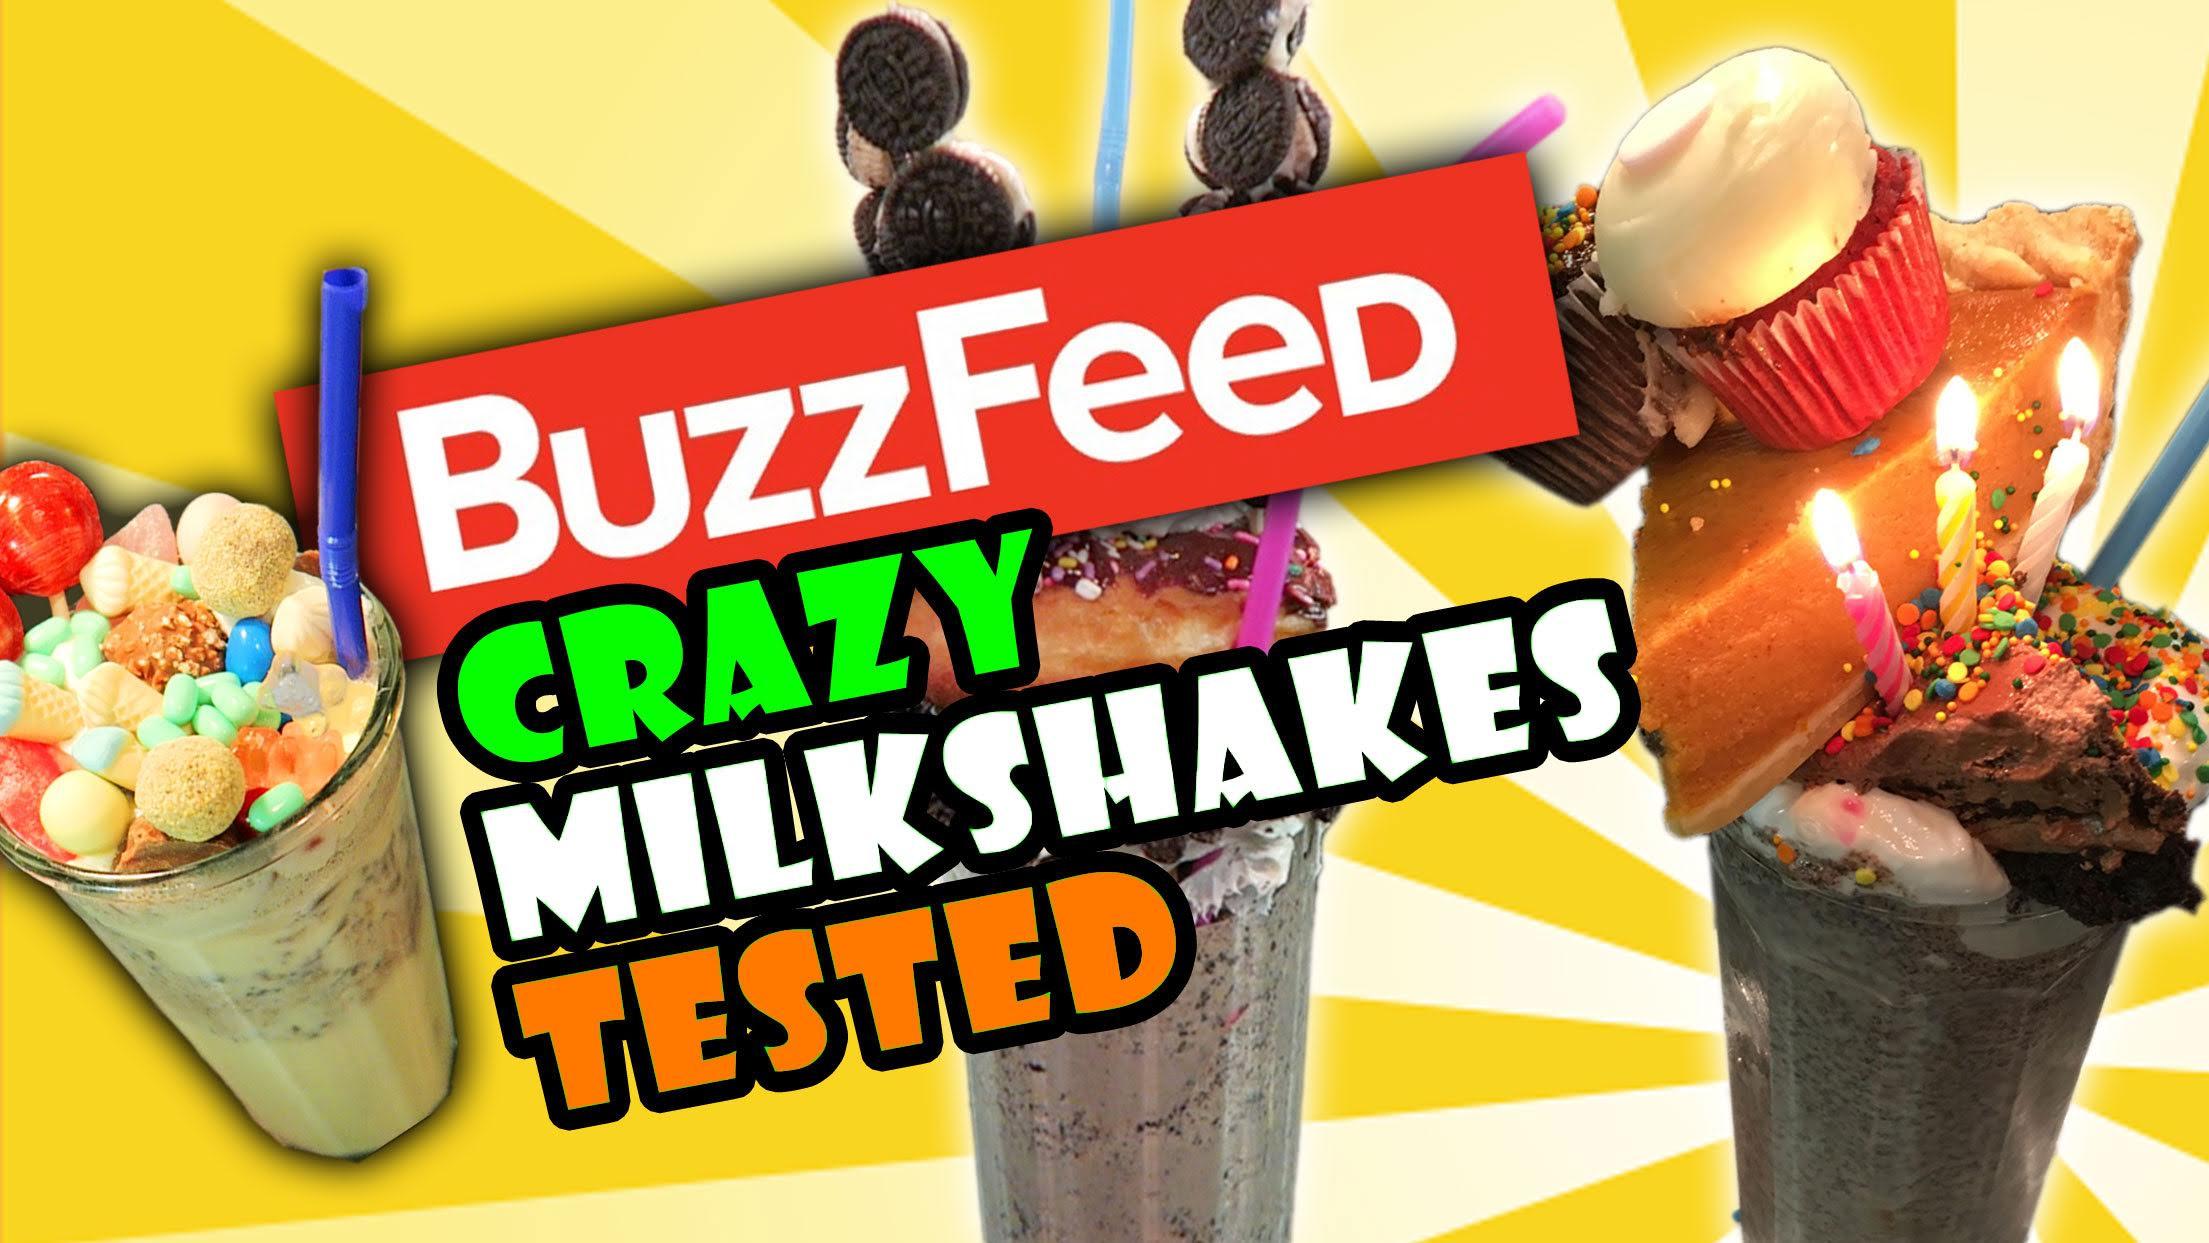 BUZZFEED Food INSANE MILKSHAKE Recipe DIY Taste Test